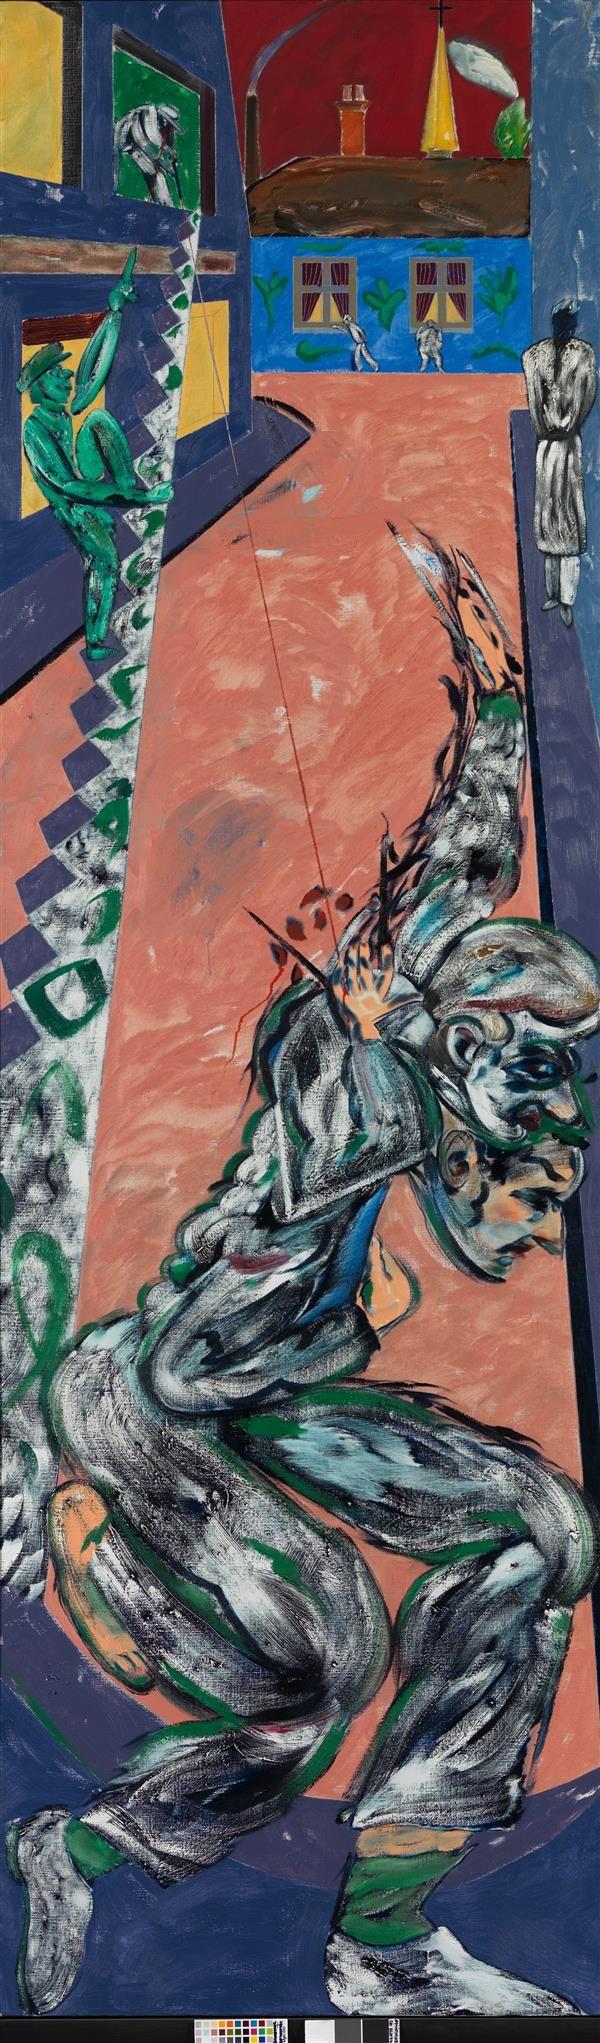 A PROMINENT 20TH CENTURY EUROPEAN COLLECTION December 8th R.B. Kitaj (1932-2007) The Sniper, 1987 Huile sur toile 305 x 91,5 cm Estimation : € 50,000-70,000